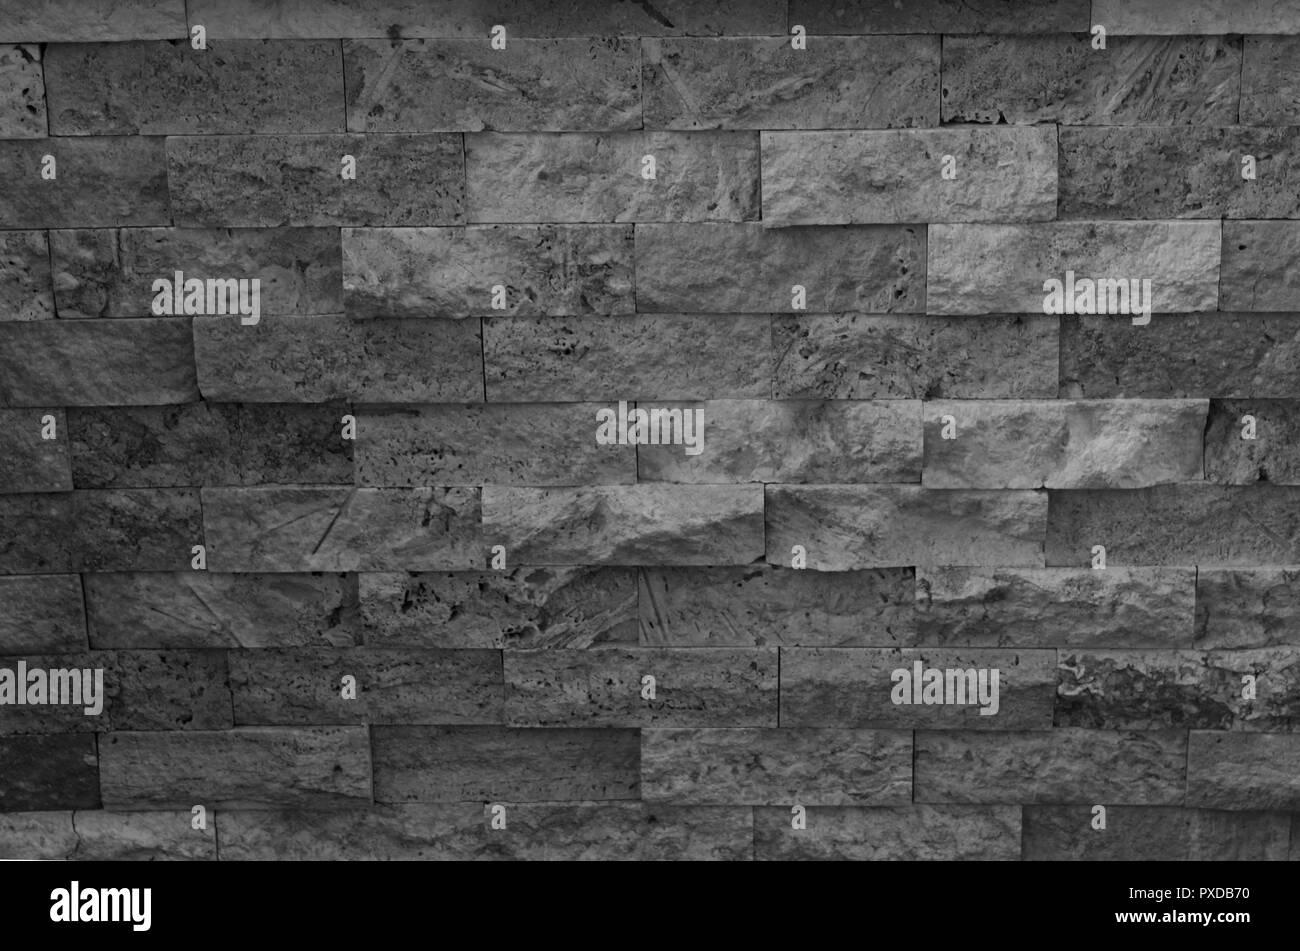 Plastic wall covers like stone brick - Stock Image